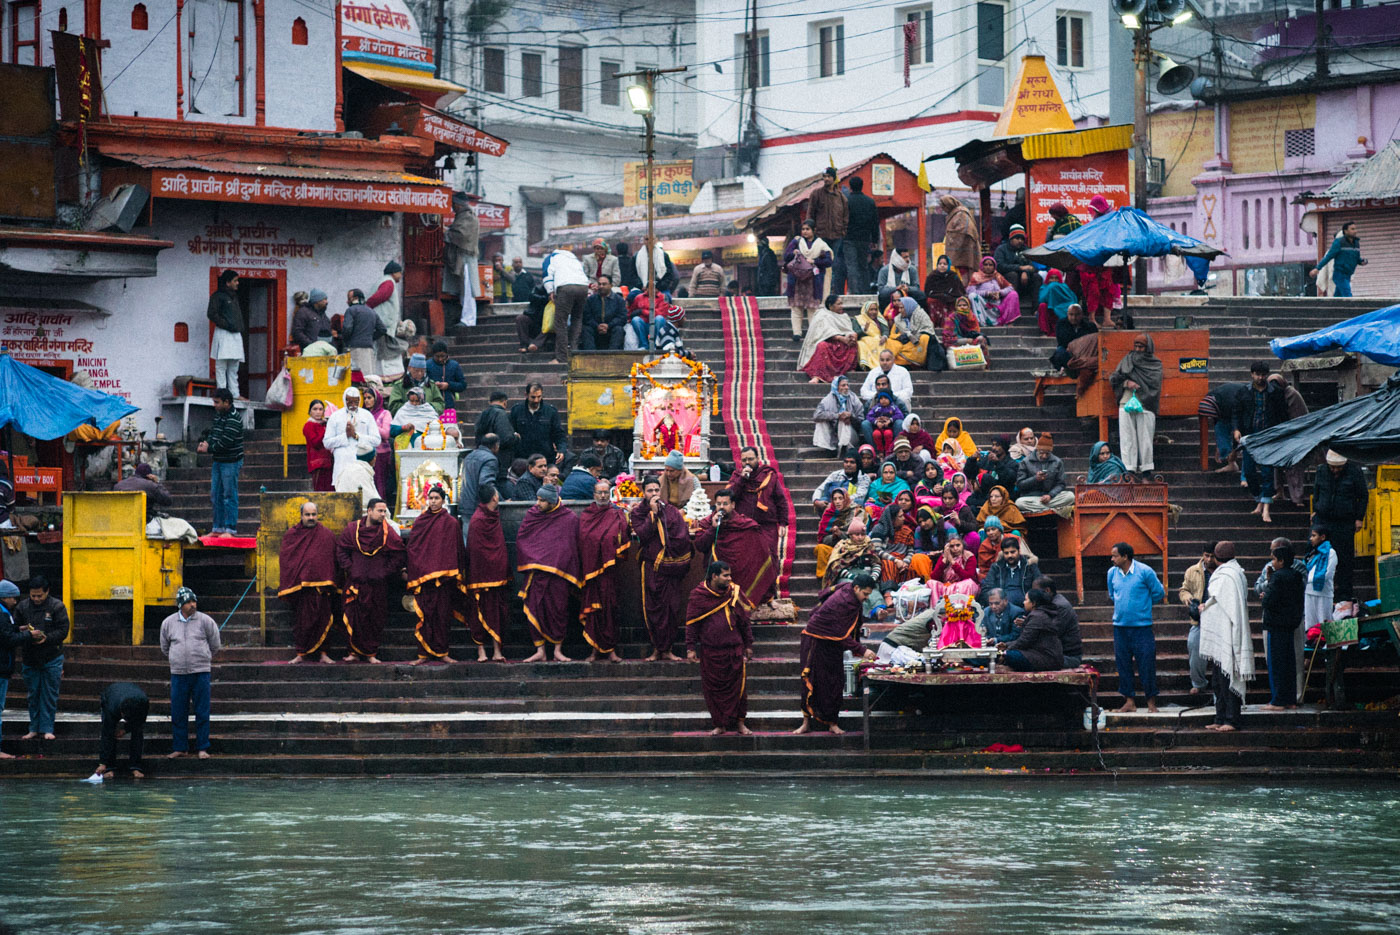 Ganges Aarti ceremony in Haridwar, India    - Leica 90mm Summarit f/2.5